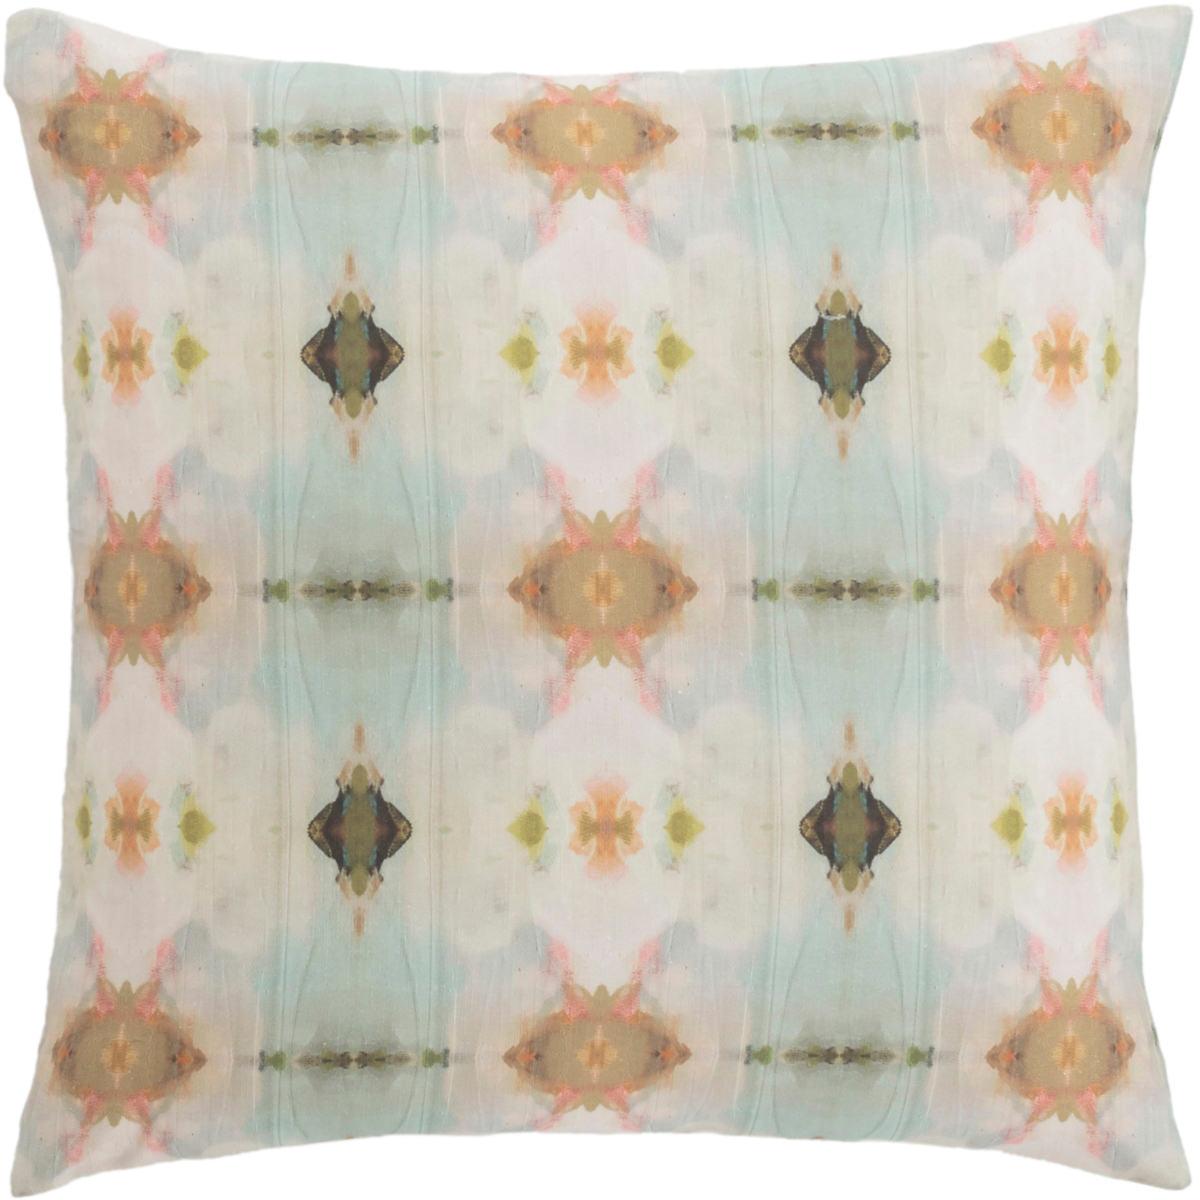 Psychedelia Sea Decorative Pillow